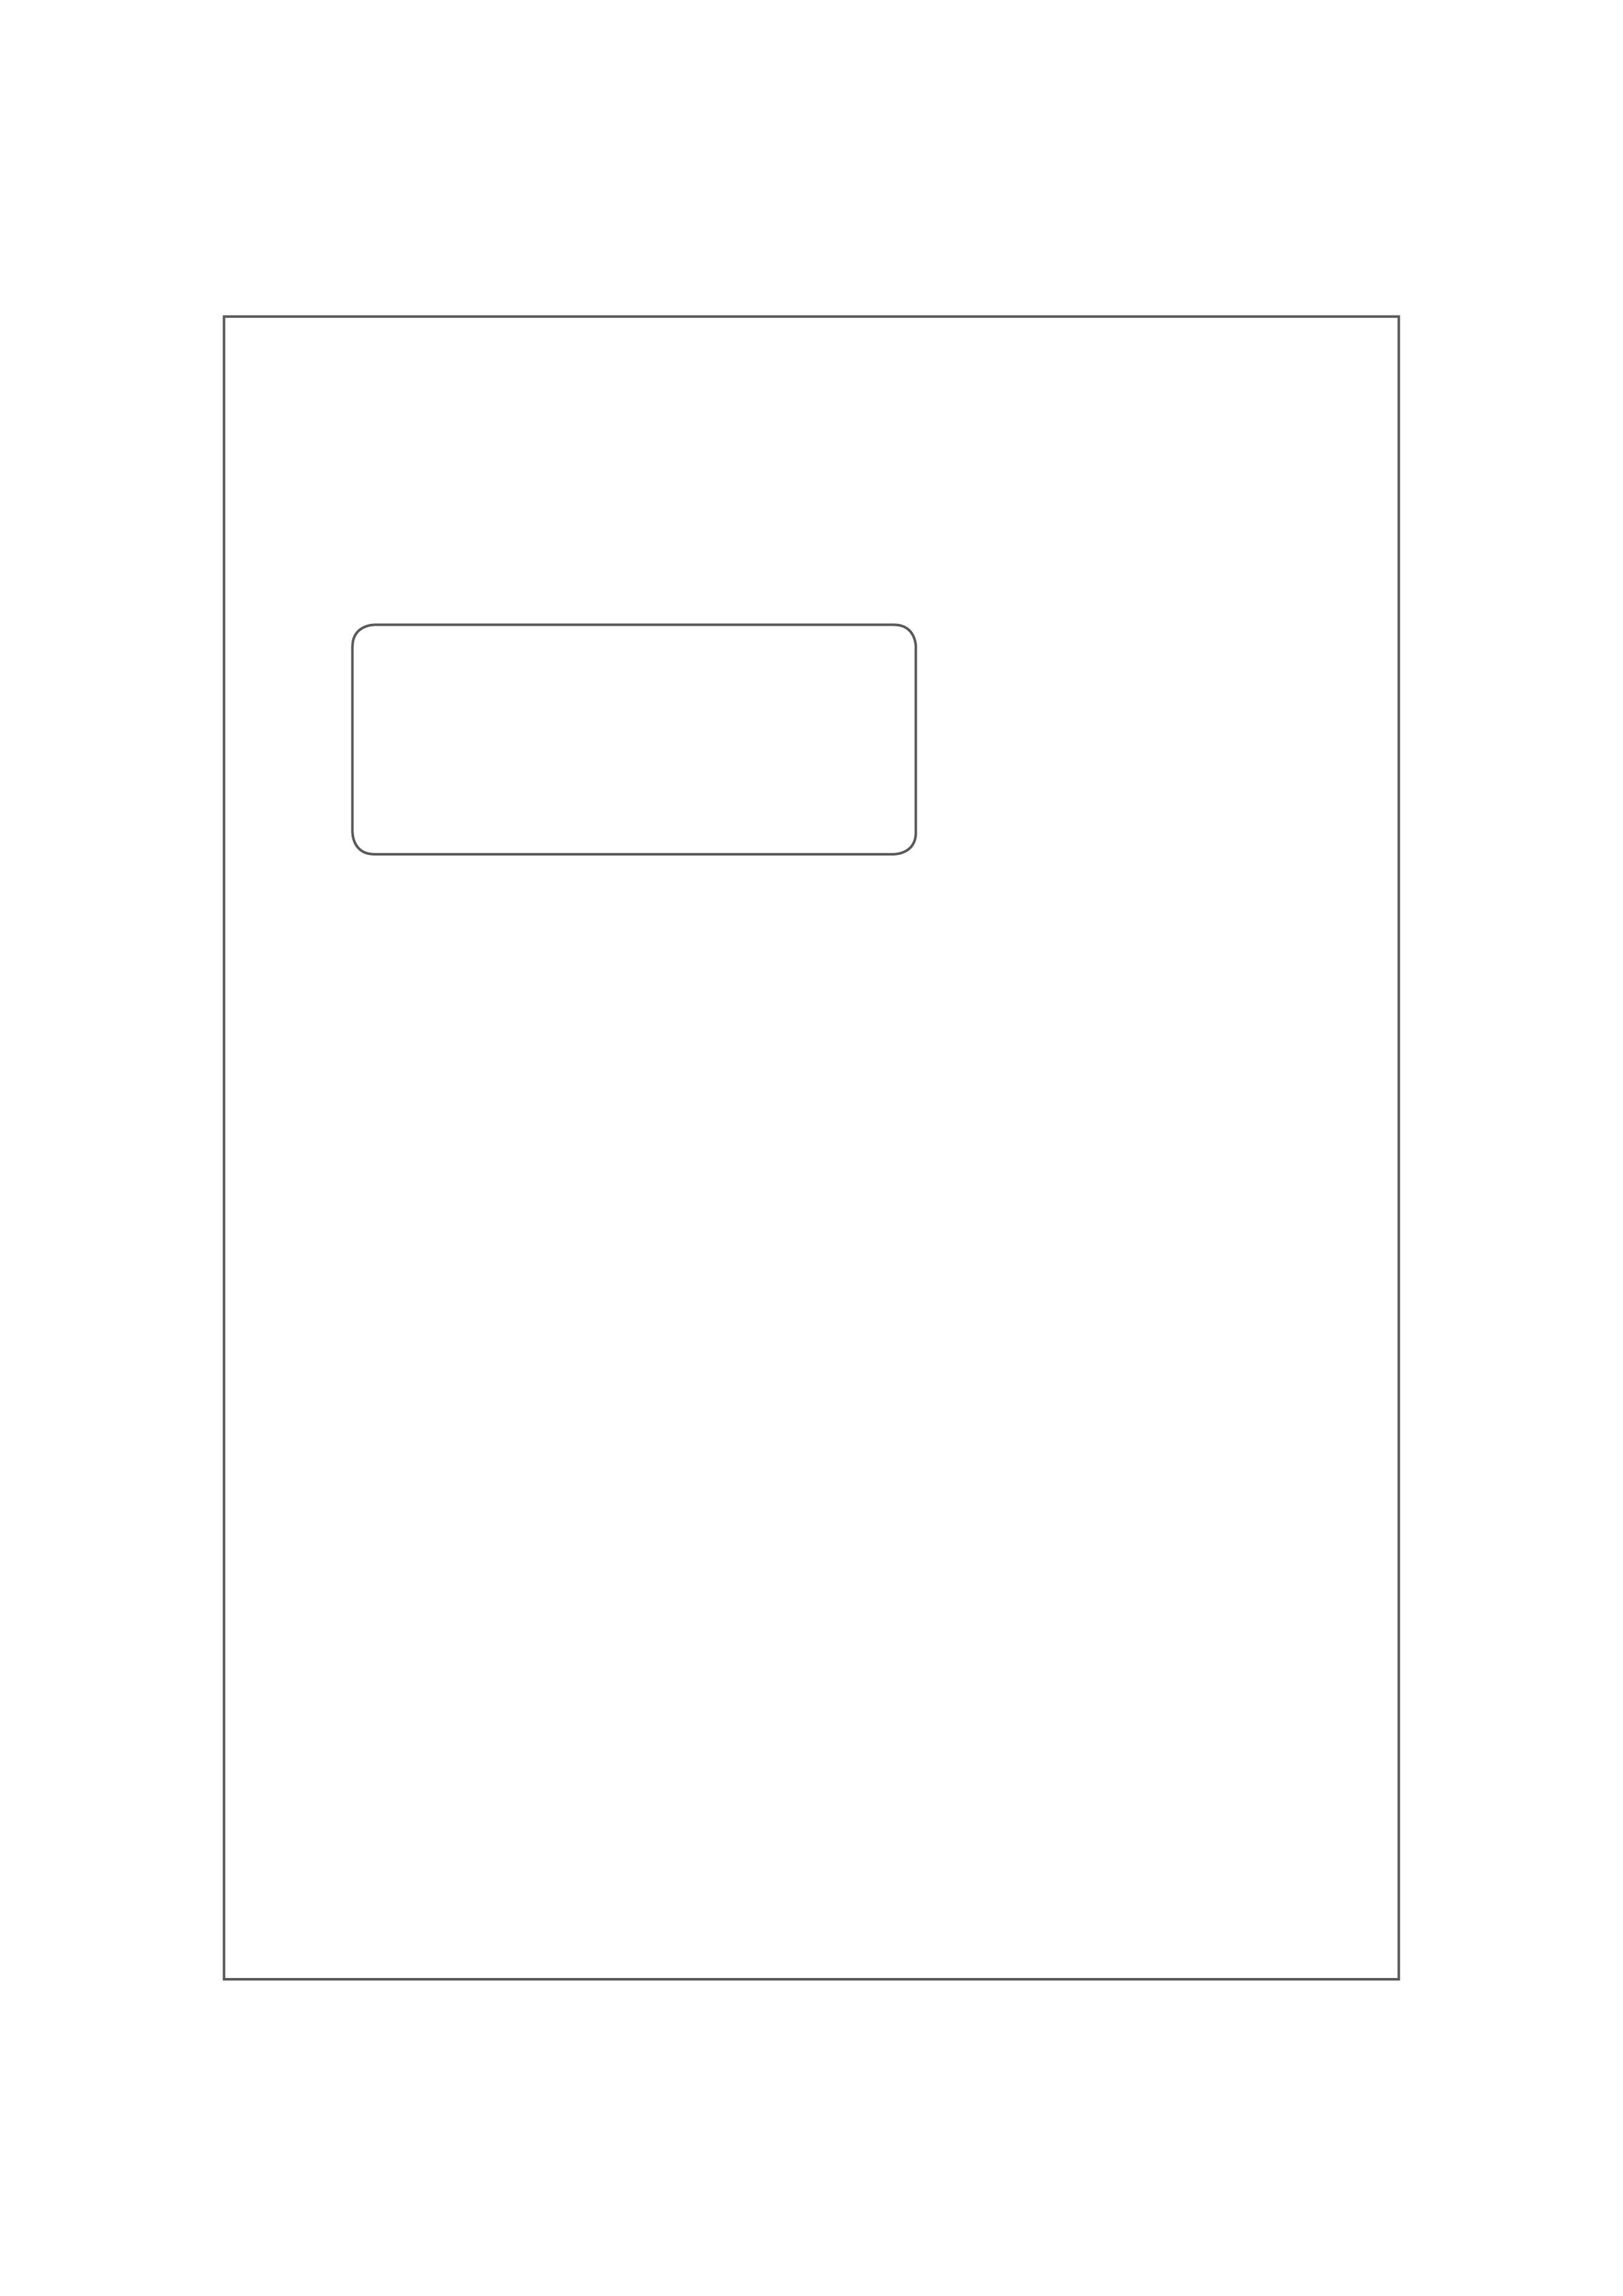 Candida C4 White Window Envelope.jpg